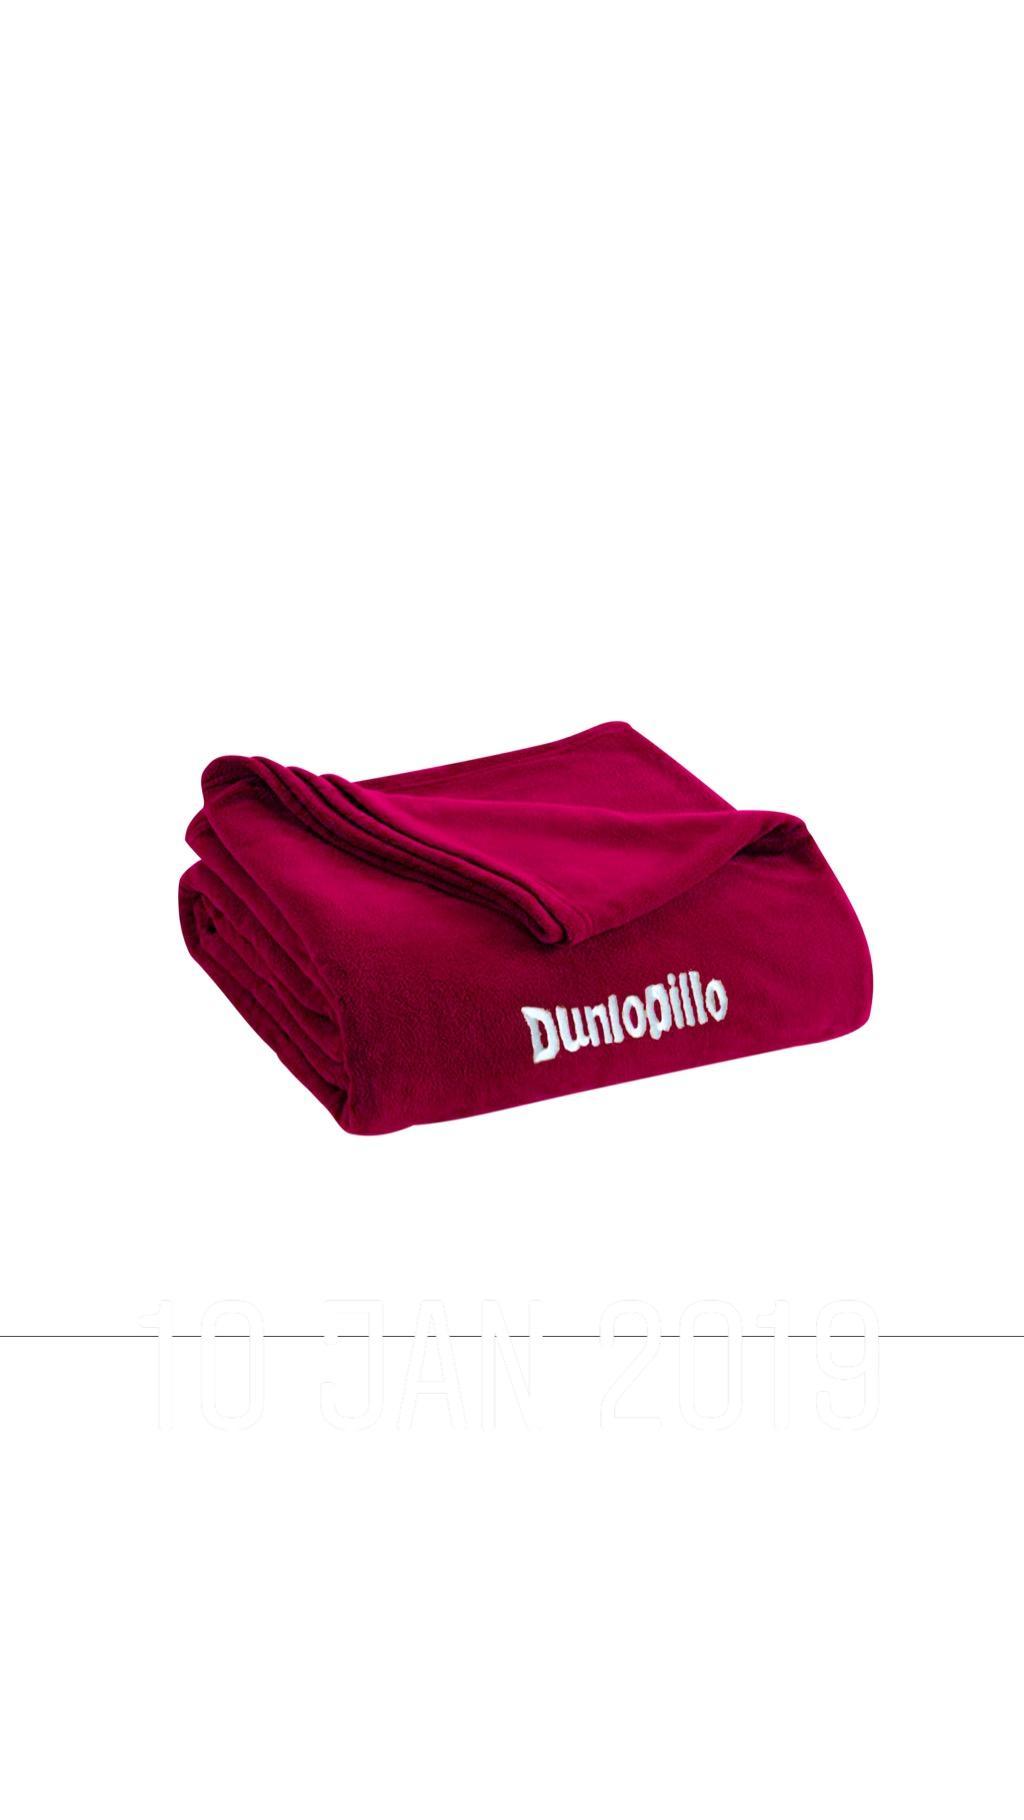 Dunlopillo Thermal & Travel Blanket / Maroon RED